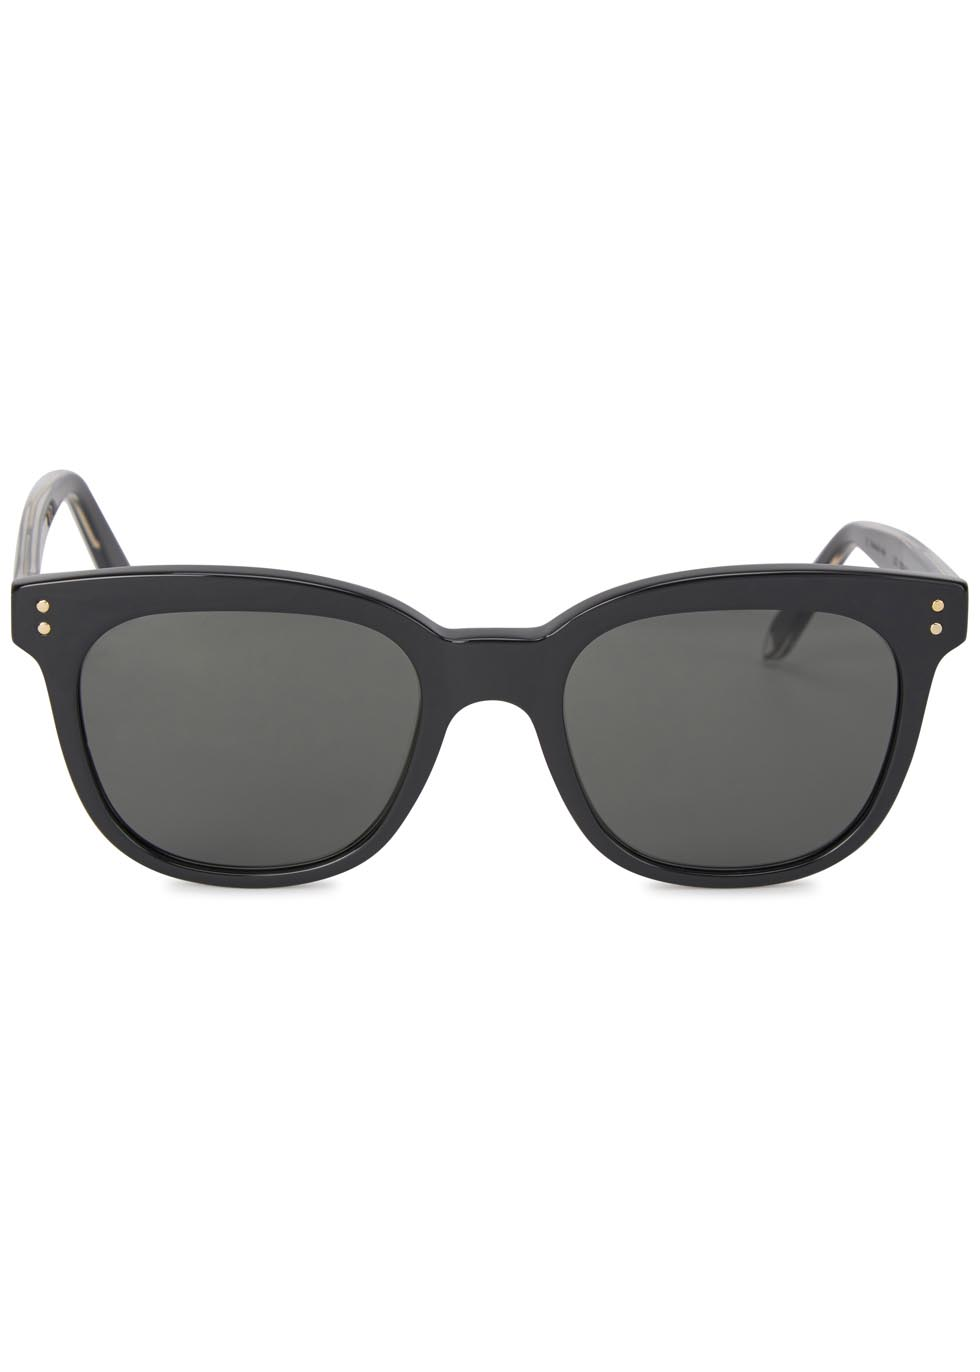 The VB black wayfarer-style sunglasses - Victoria Beckham